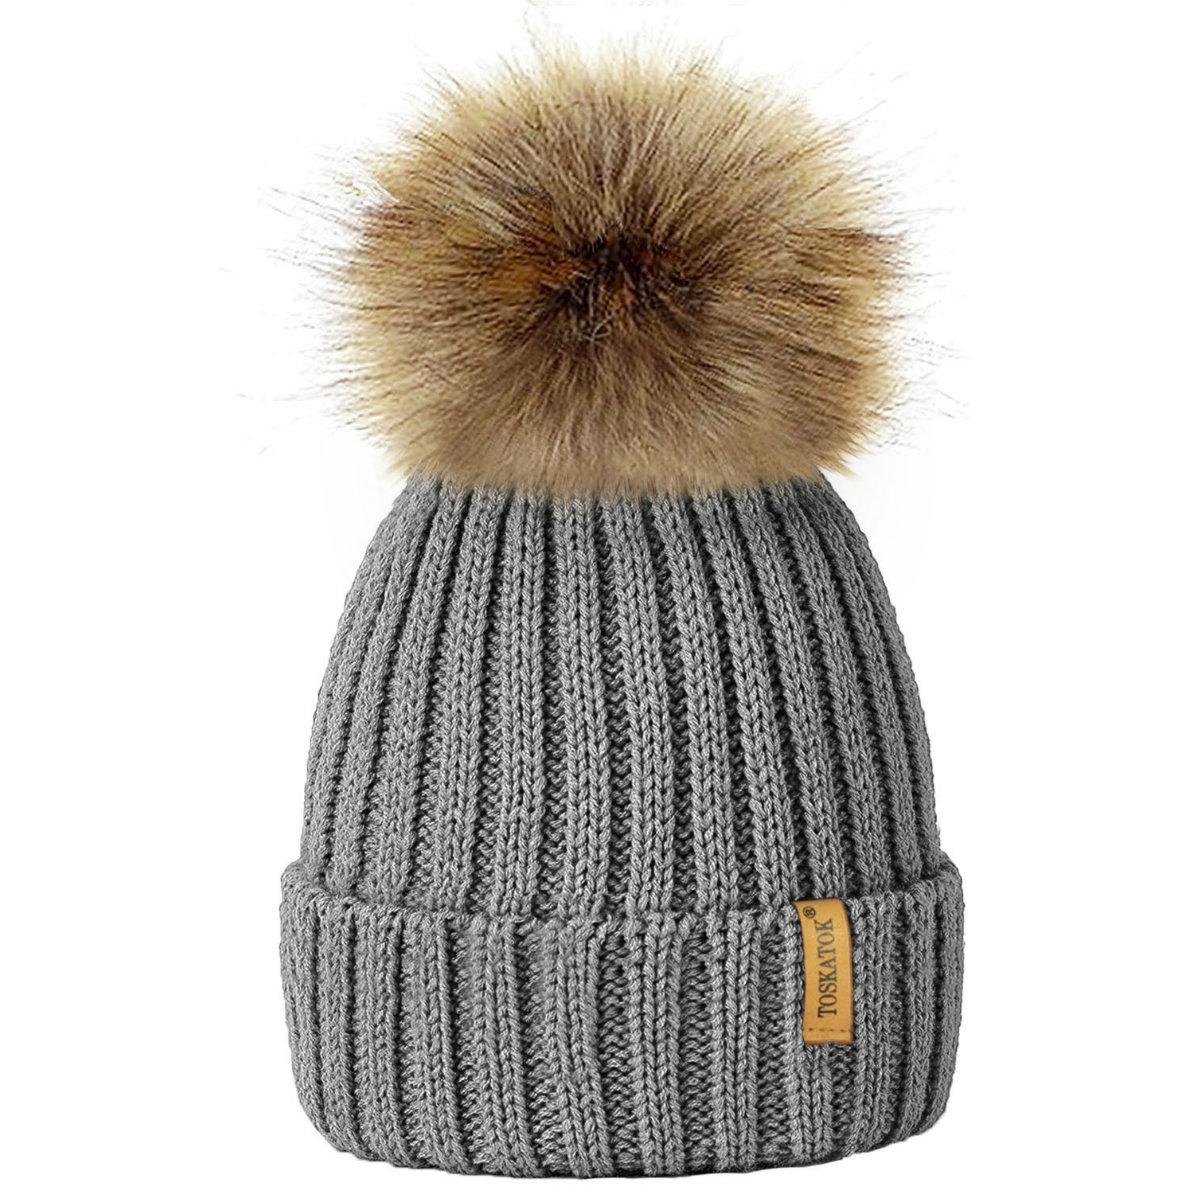 Ribbed Beanie Hat With Faux Fur Pom Pom (Grey) – Muddy-Footprints f14298e3e2c